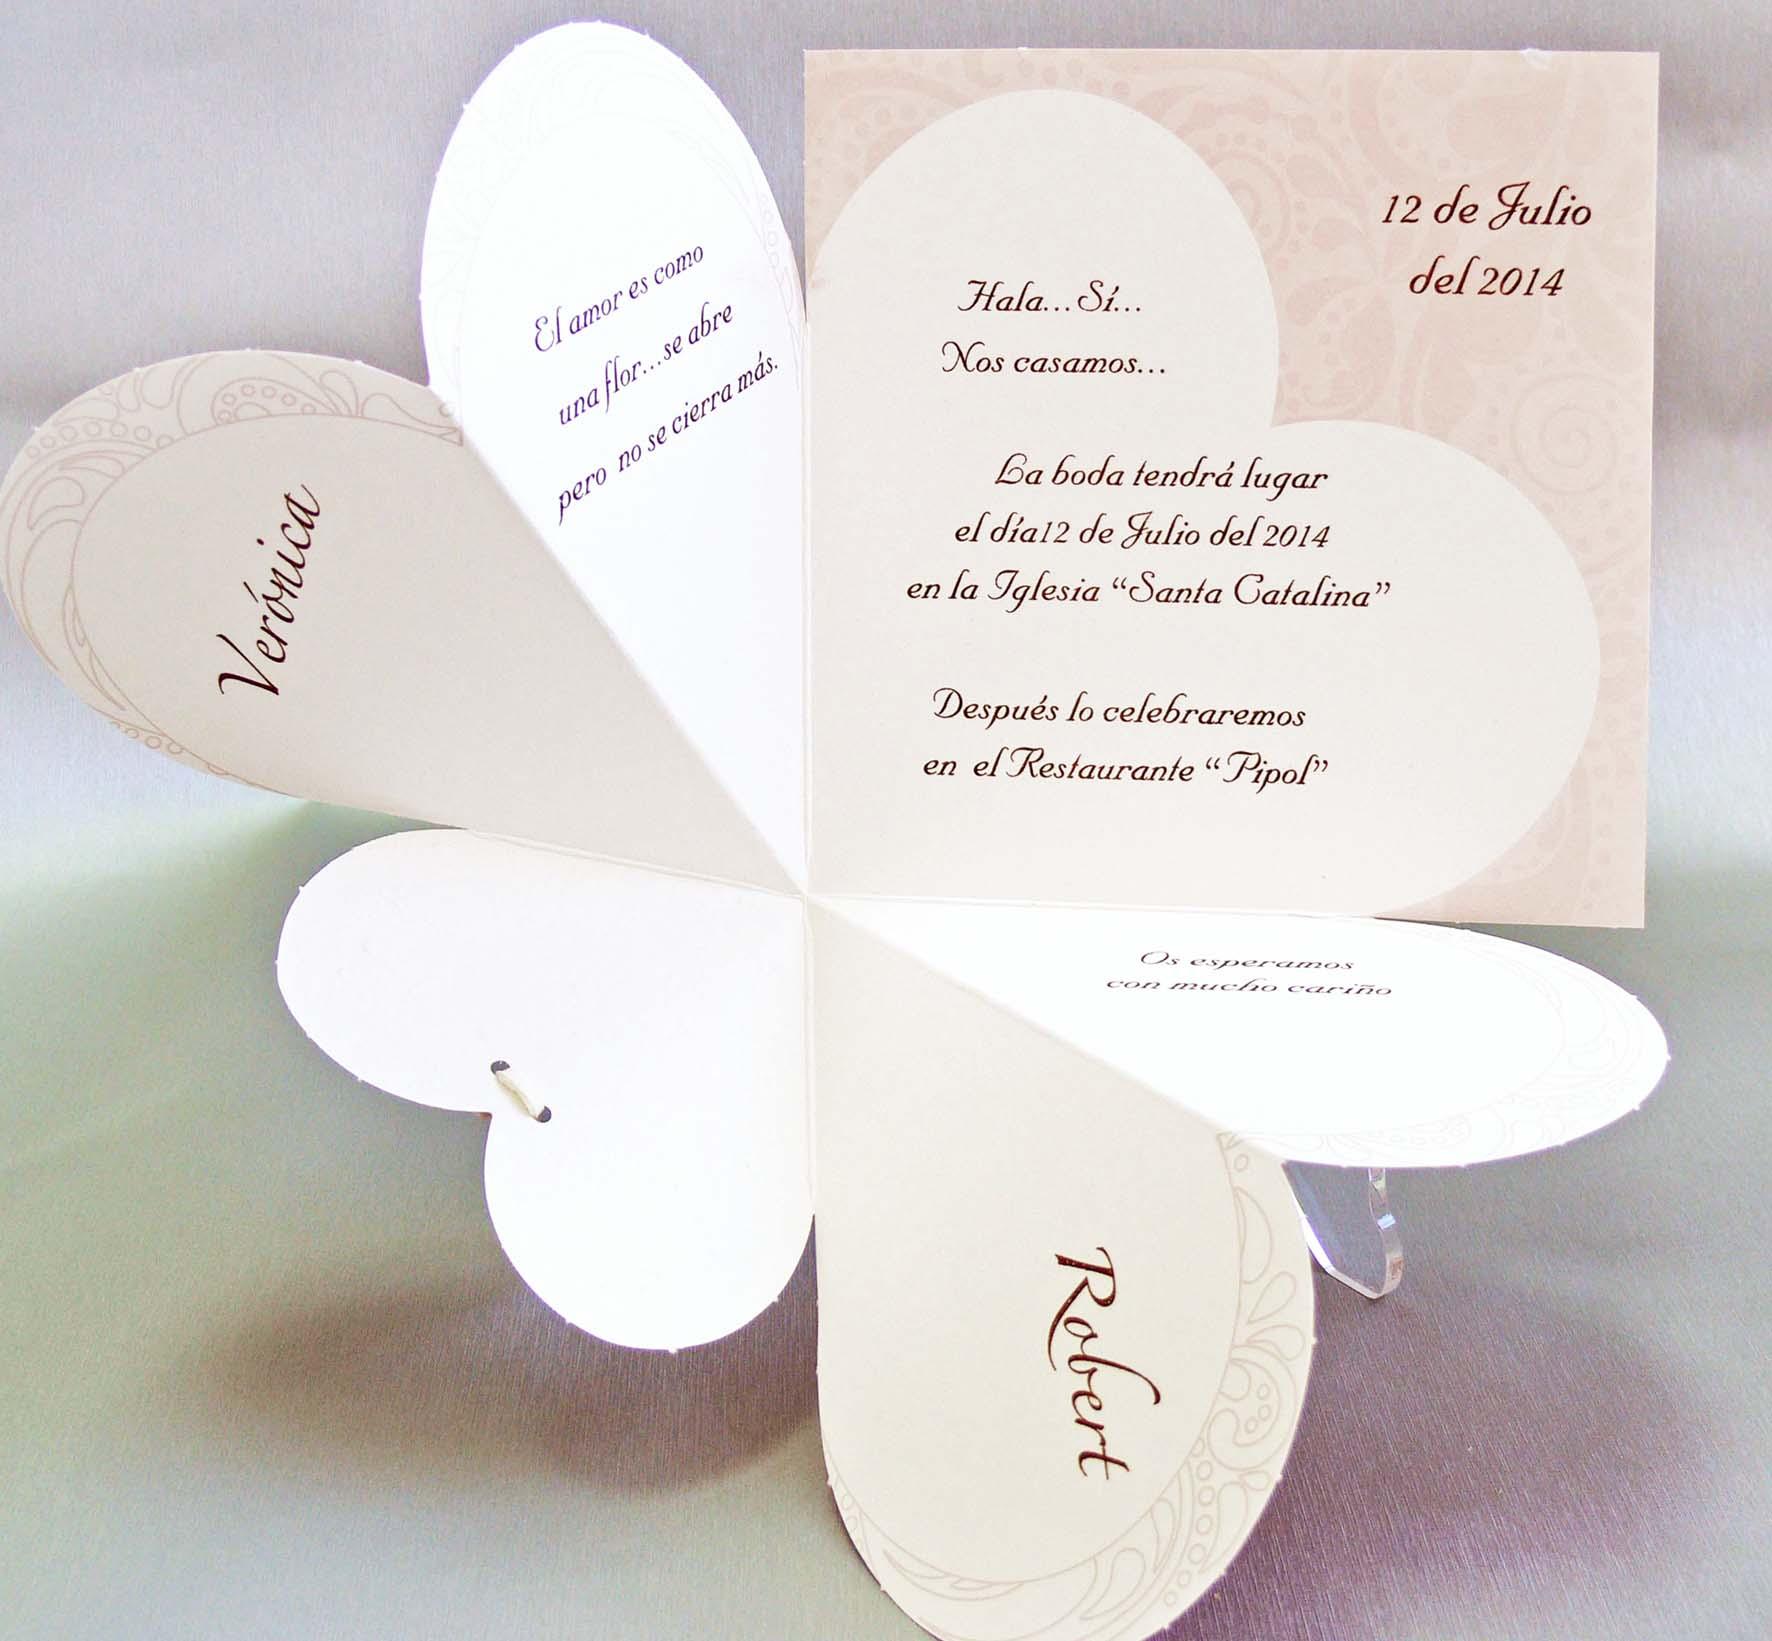 Invitaci n de boda 32826 - Como preparar mi boda ...